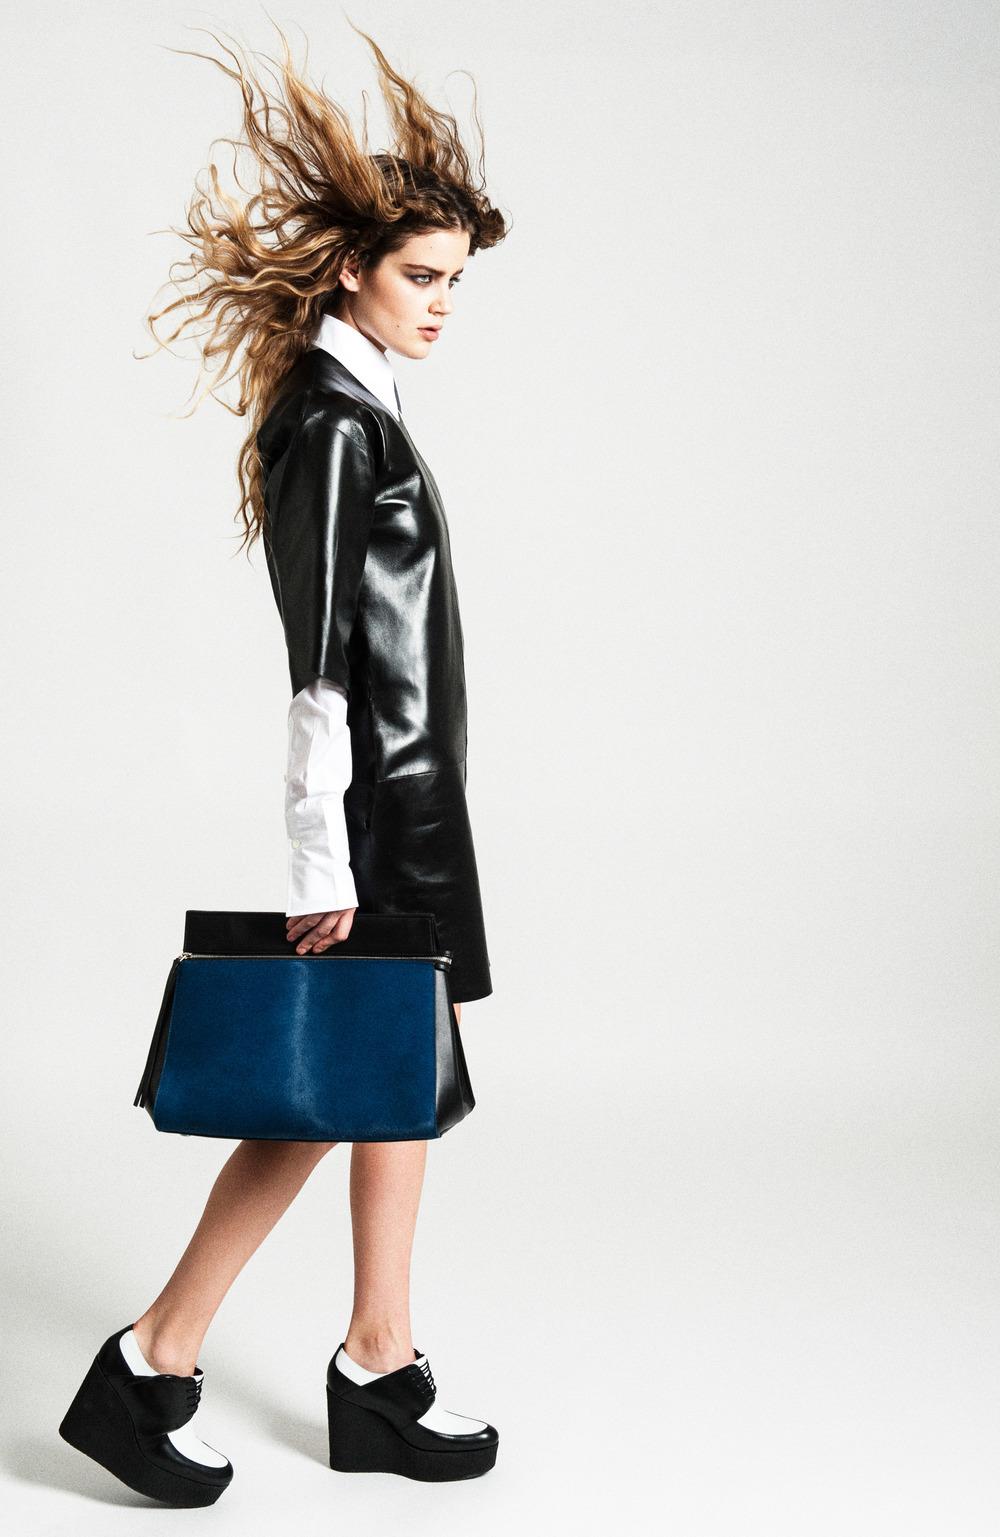 Fashion_by_LeandroJusten_001.jpg